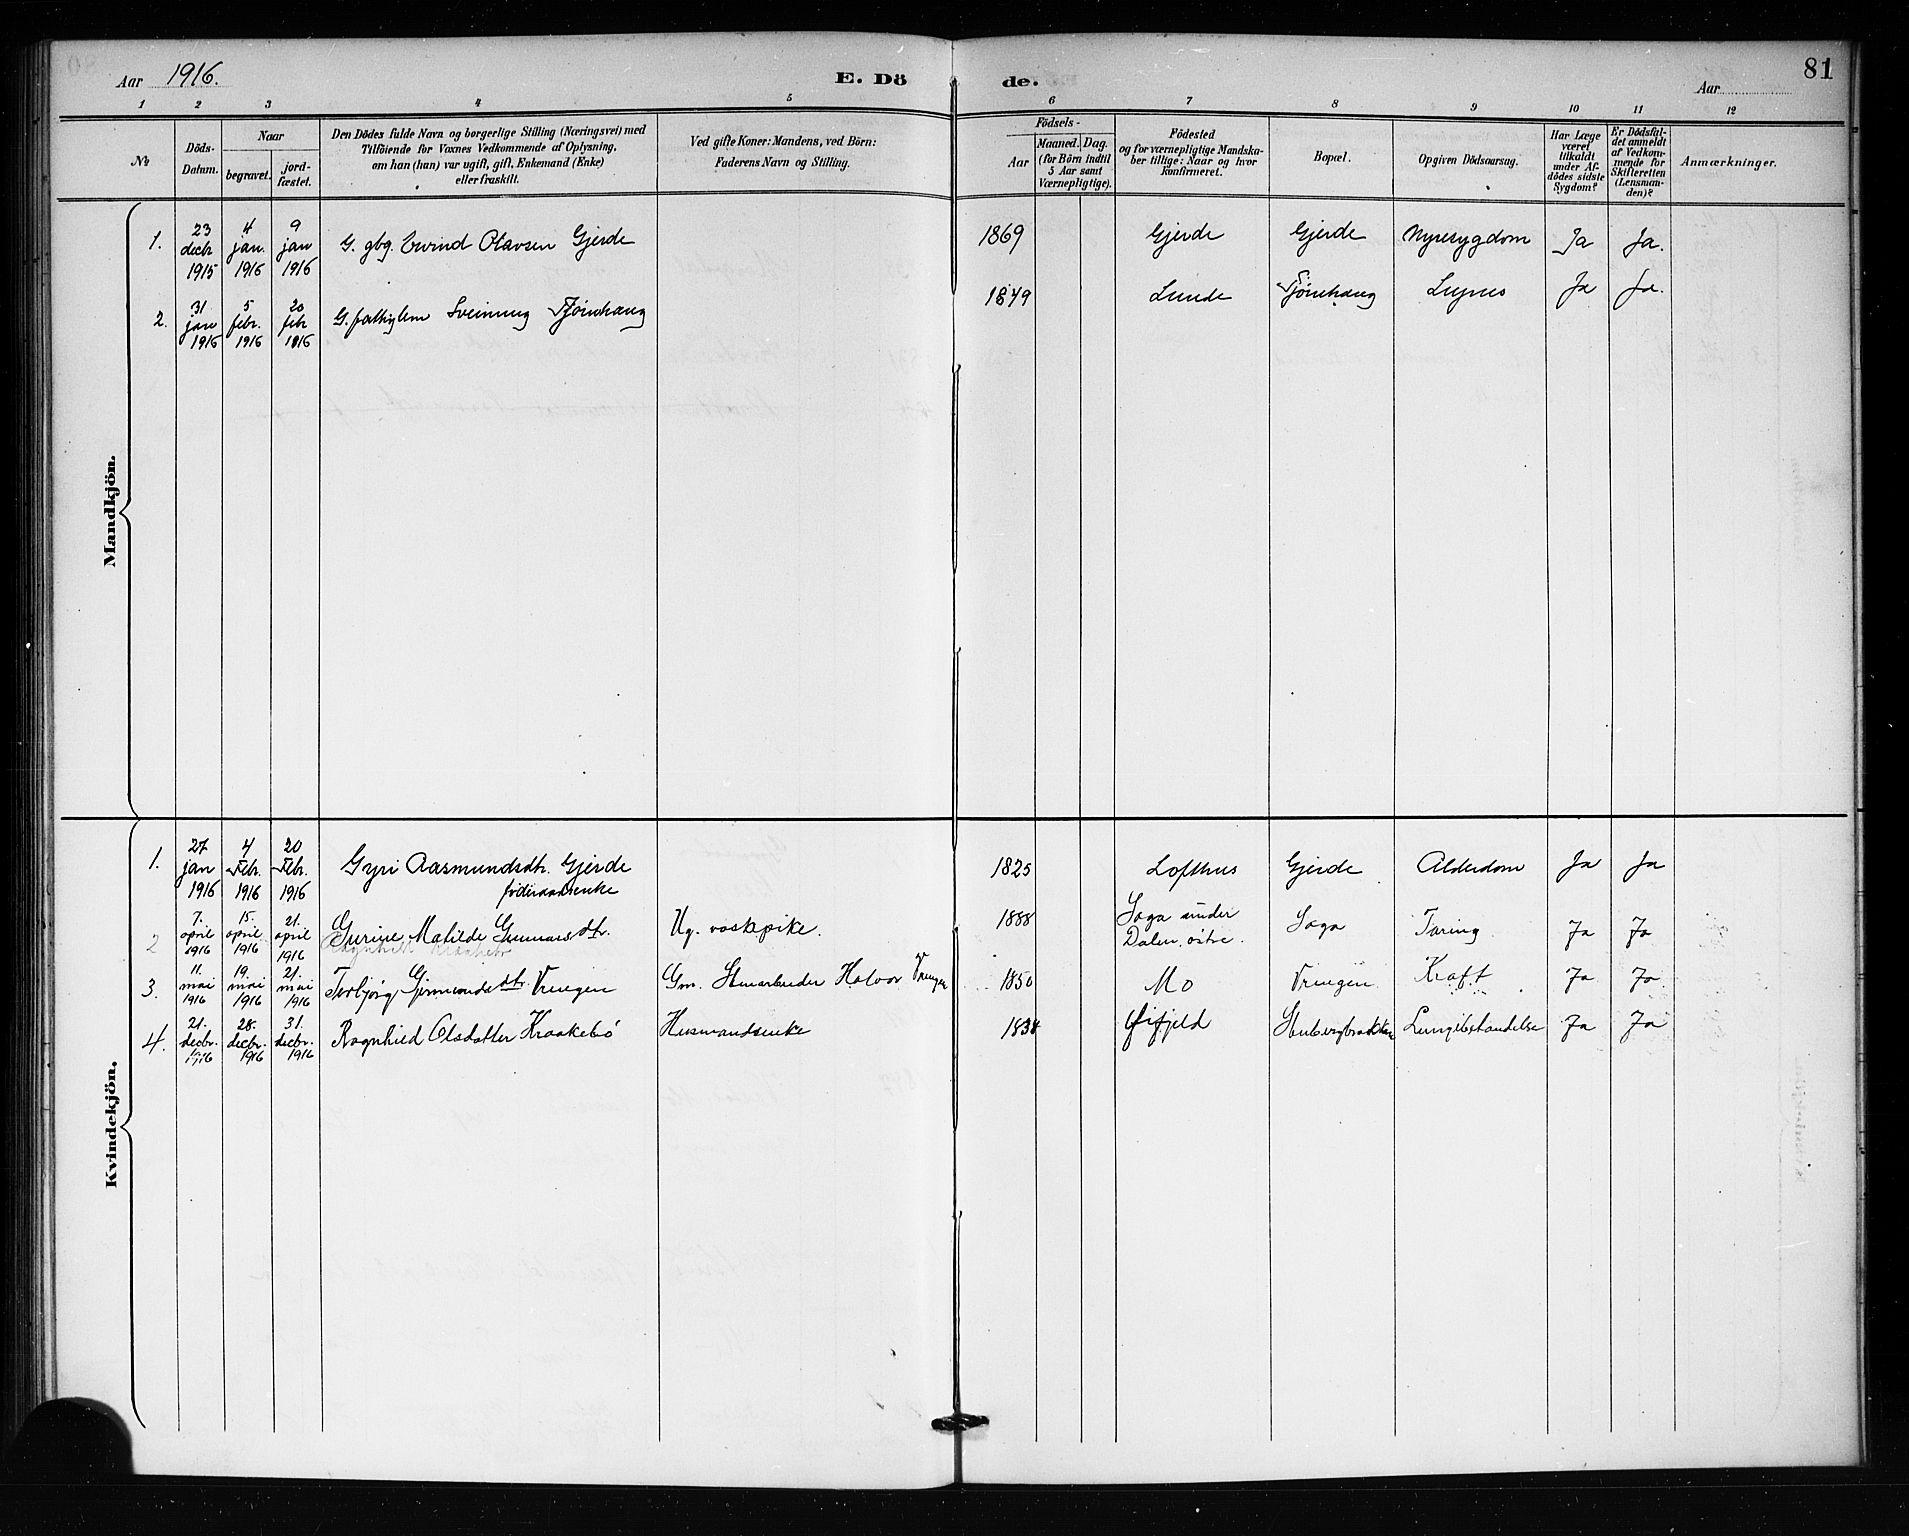 SAKO, Lårdal kirkebøker, G/Gb/L0003: Klokkerbok nr. II 3, 1889-1920, s. 81